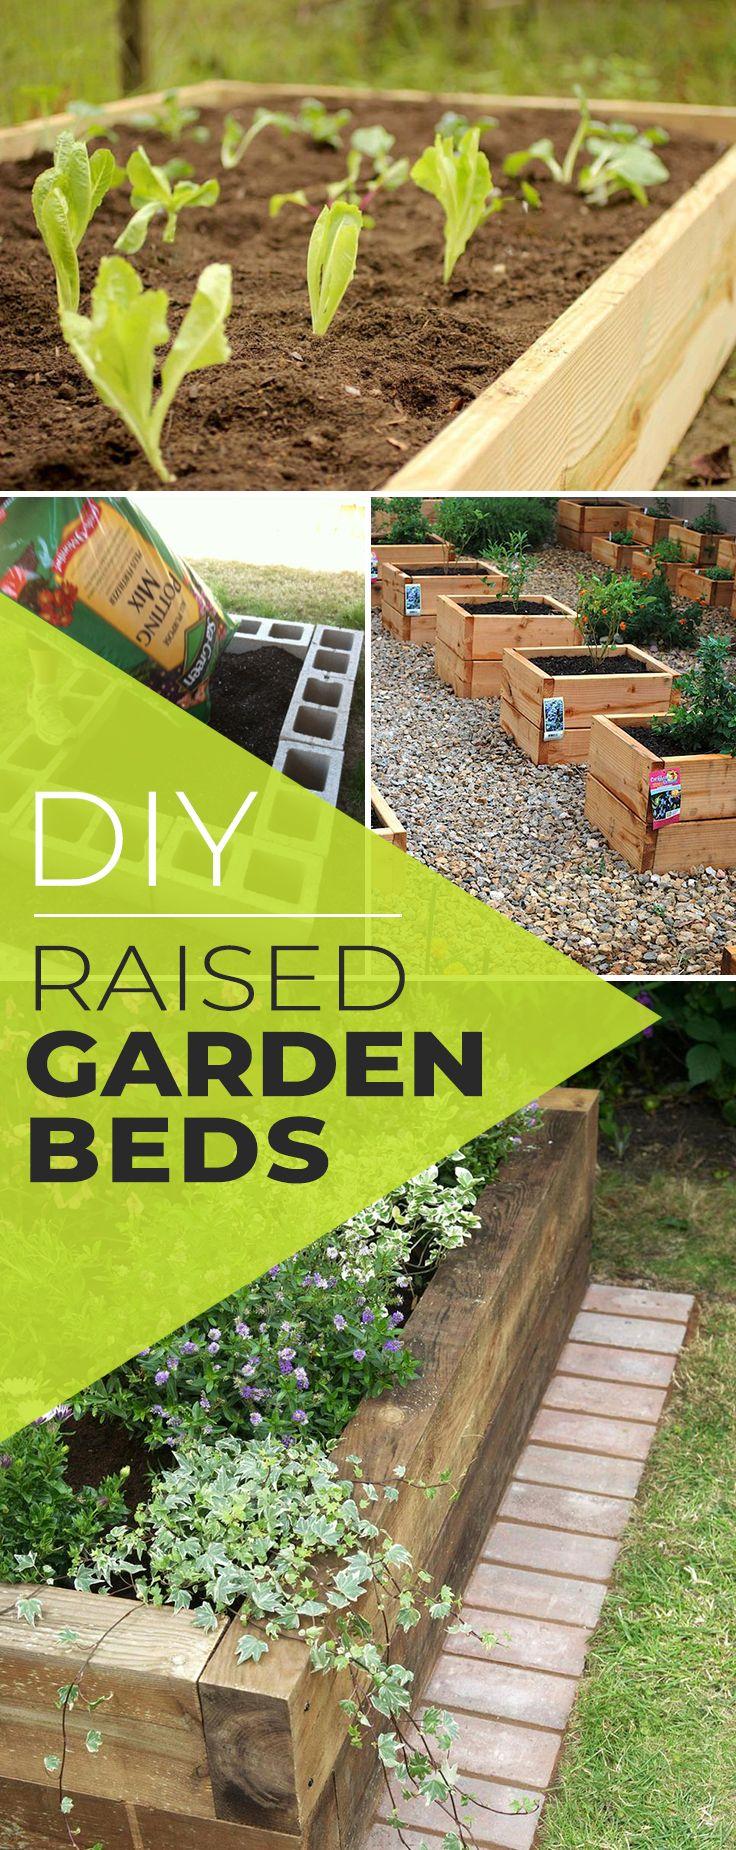 14644 best Garden Ideas Projects images on Pinterest Gardening